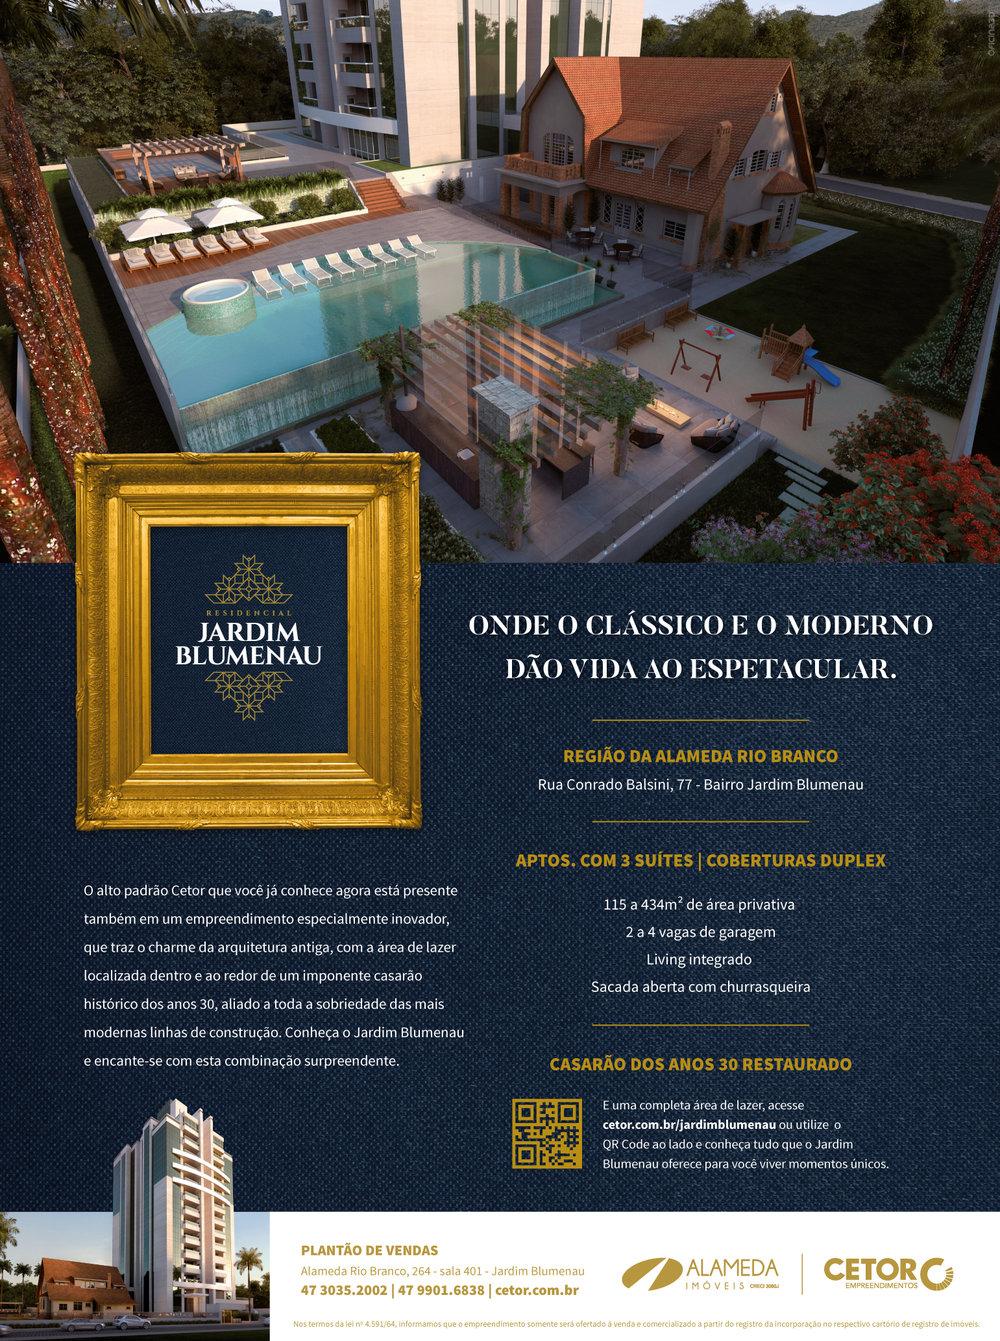 10577_Cetor_Jardim Blumenau_Anuncio Jornal 1PG-01.jpg